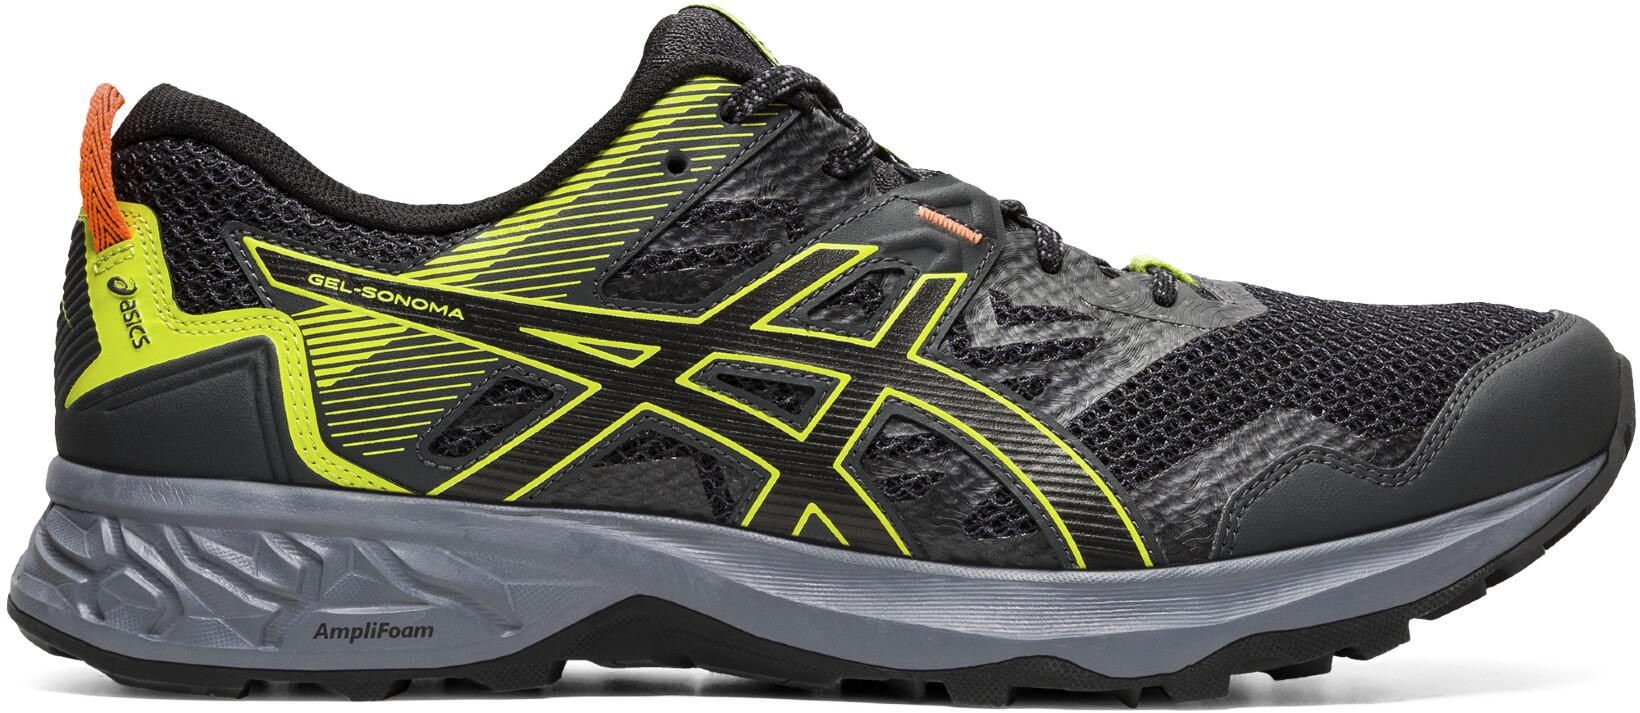 Asics Gel- Sonoma 5 Running Shoes | Sko